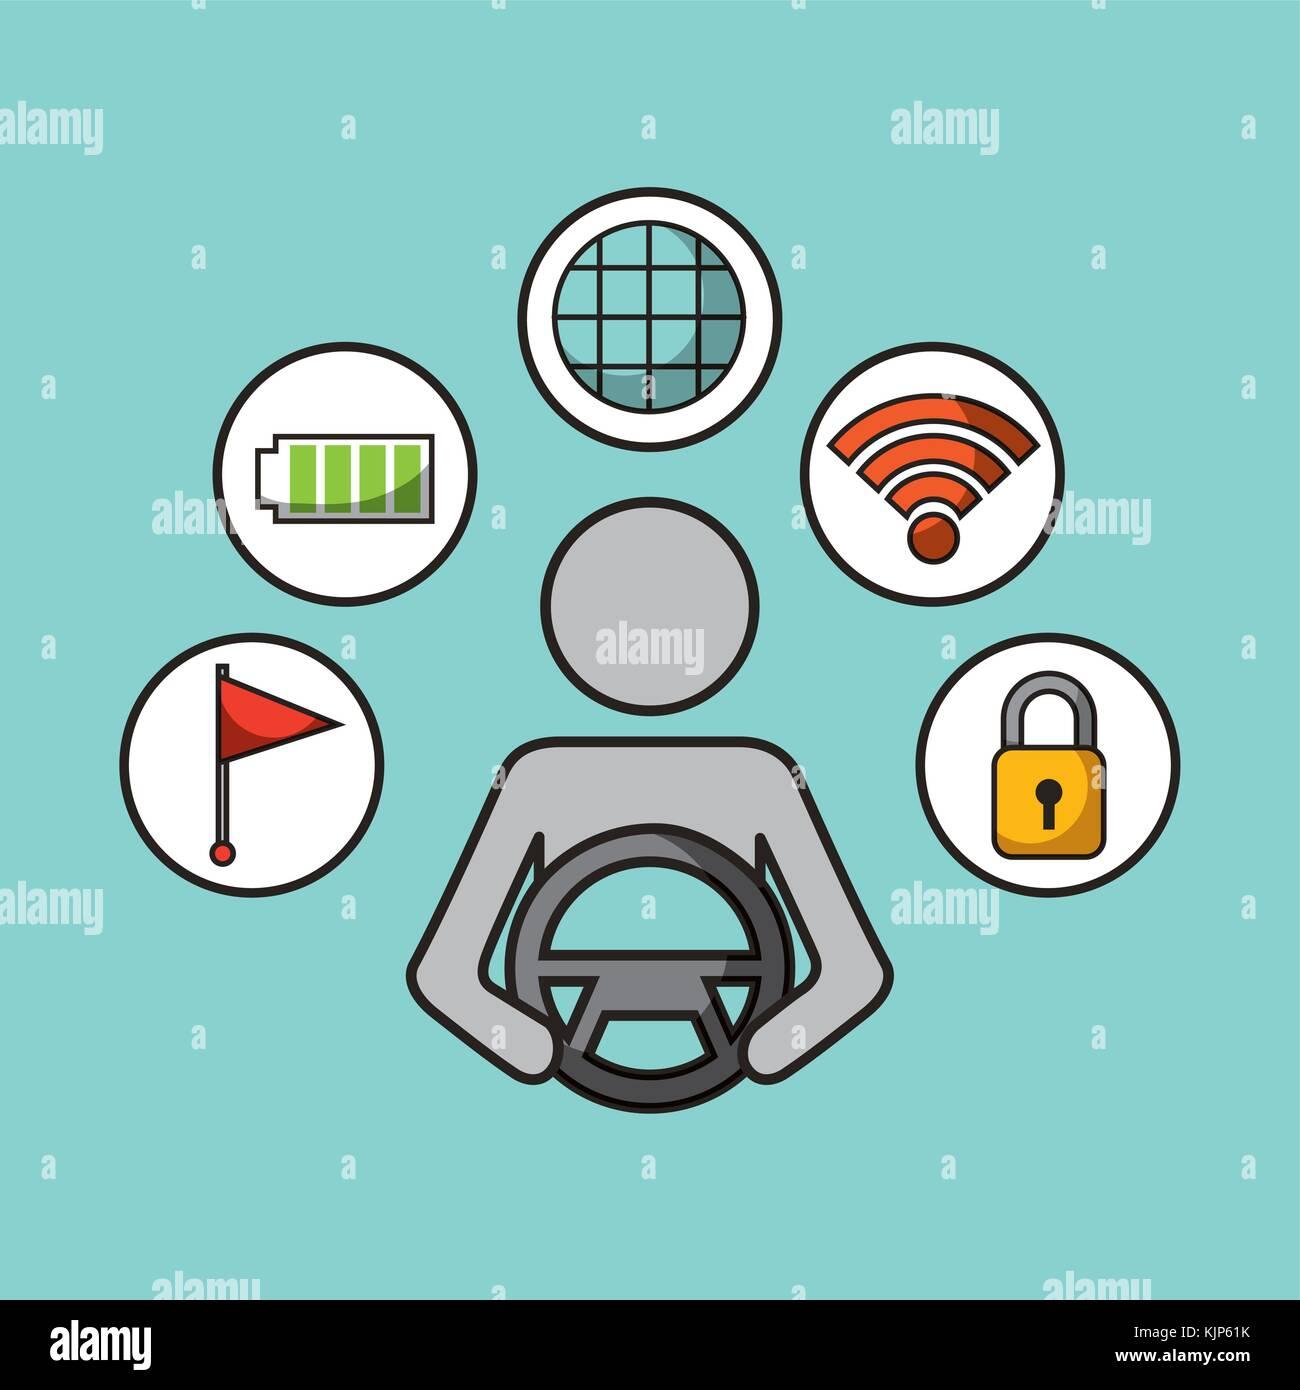 Self Sensor Stockfotos & Self Sensor Bilder - Alamy